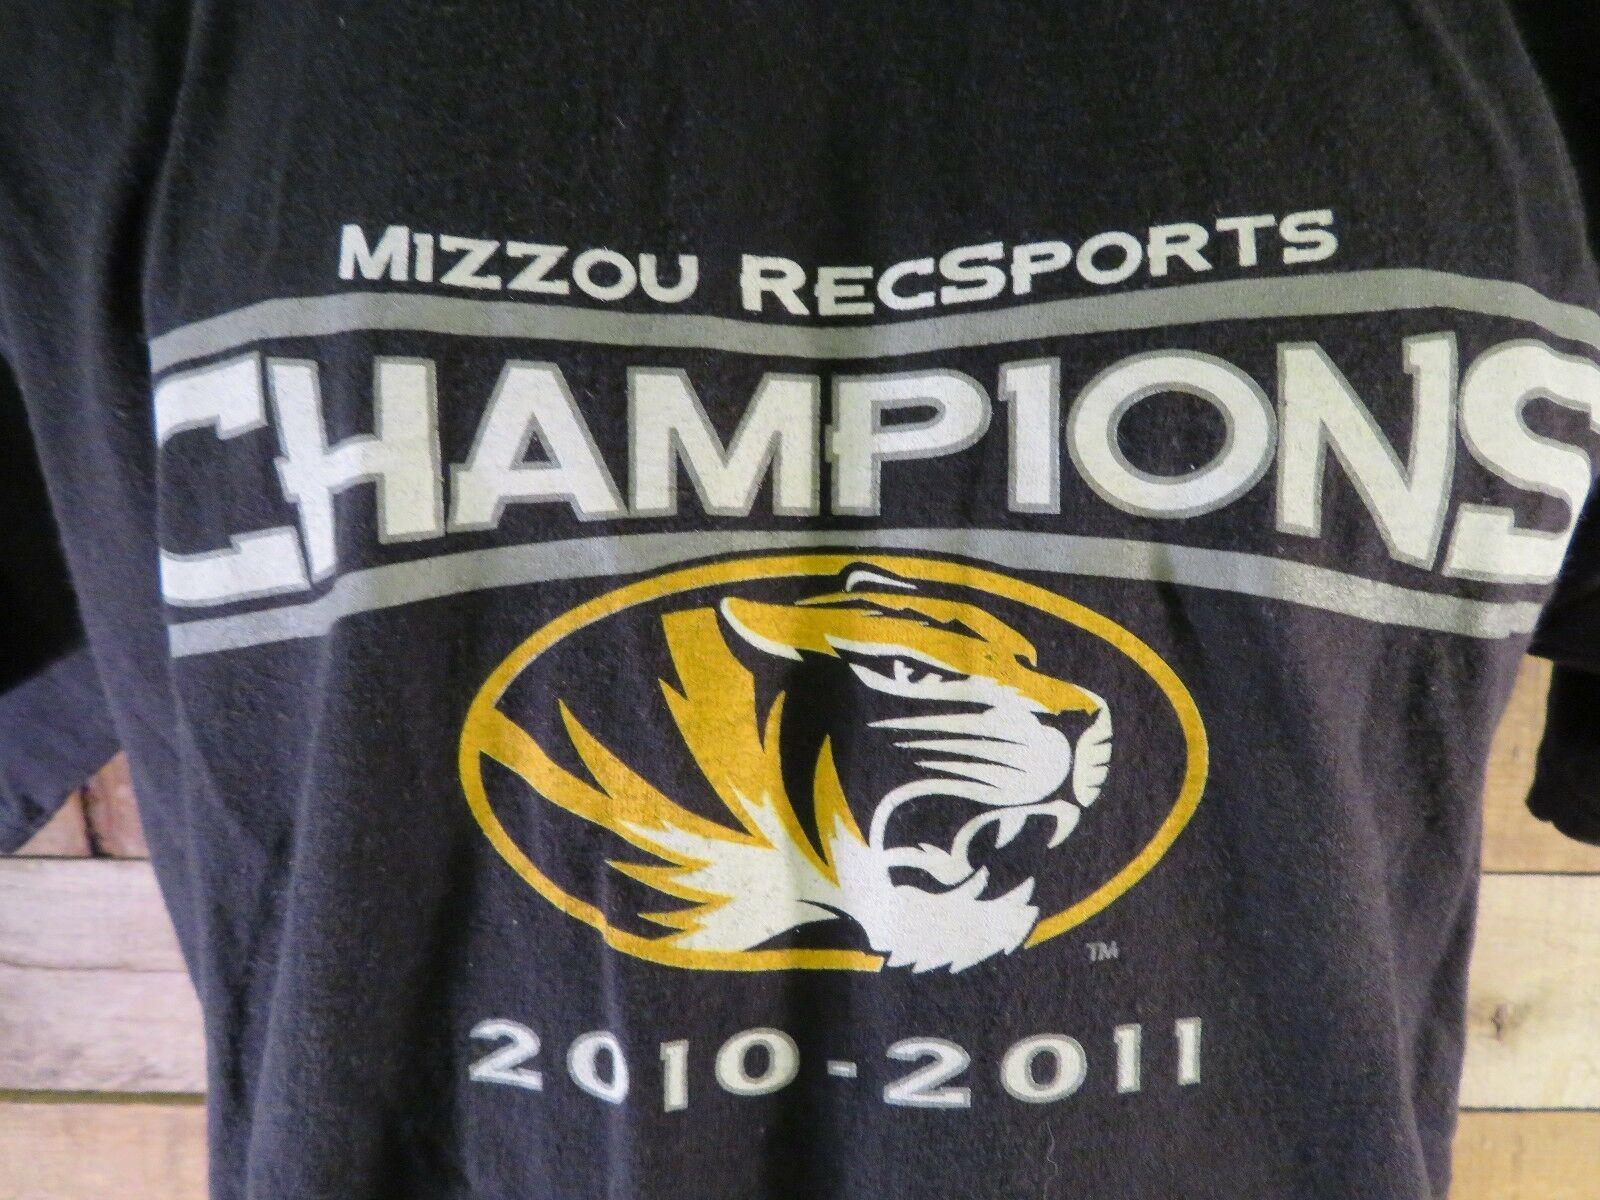 Mizzou Recsports Champions 2010-2011 T-Shirt Taille M